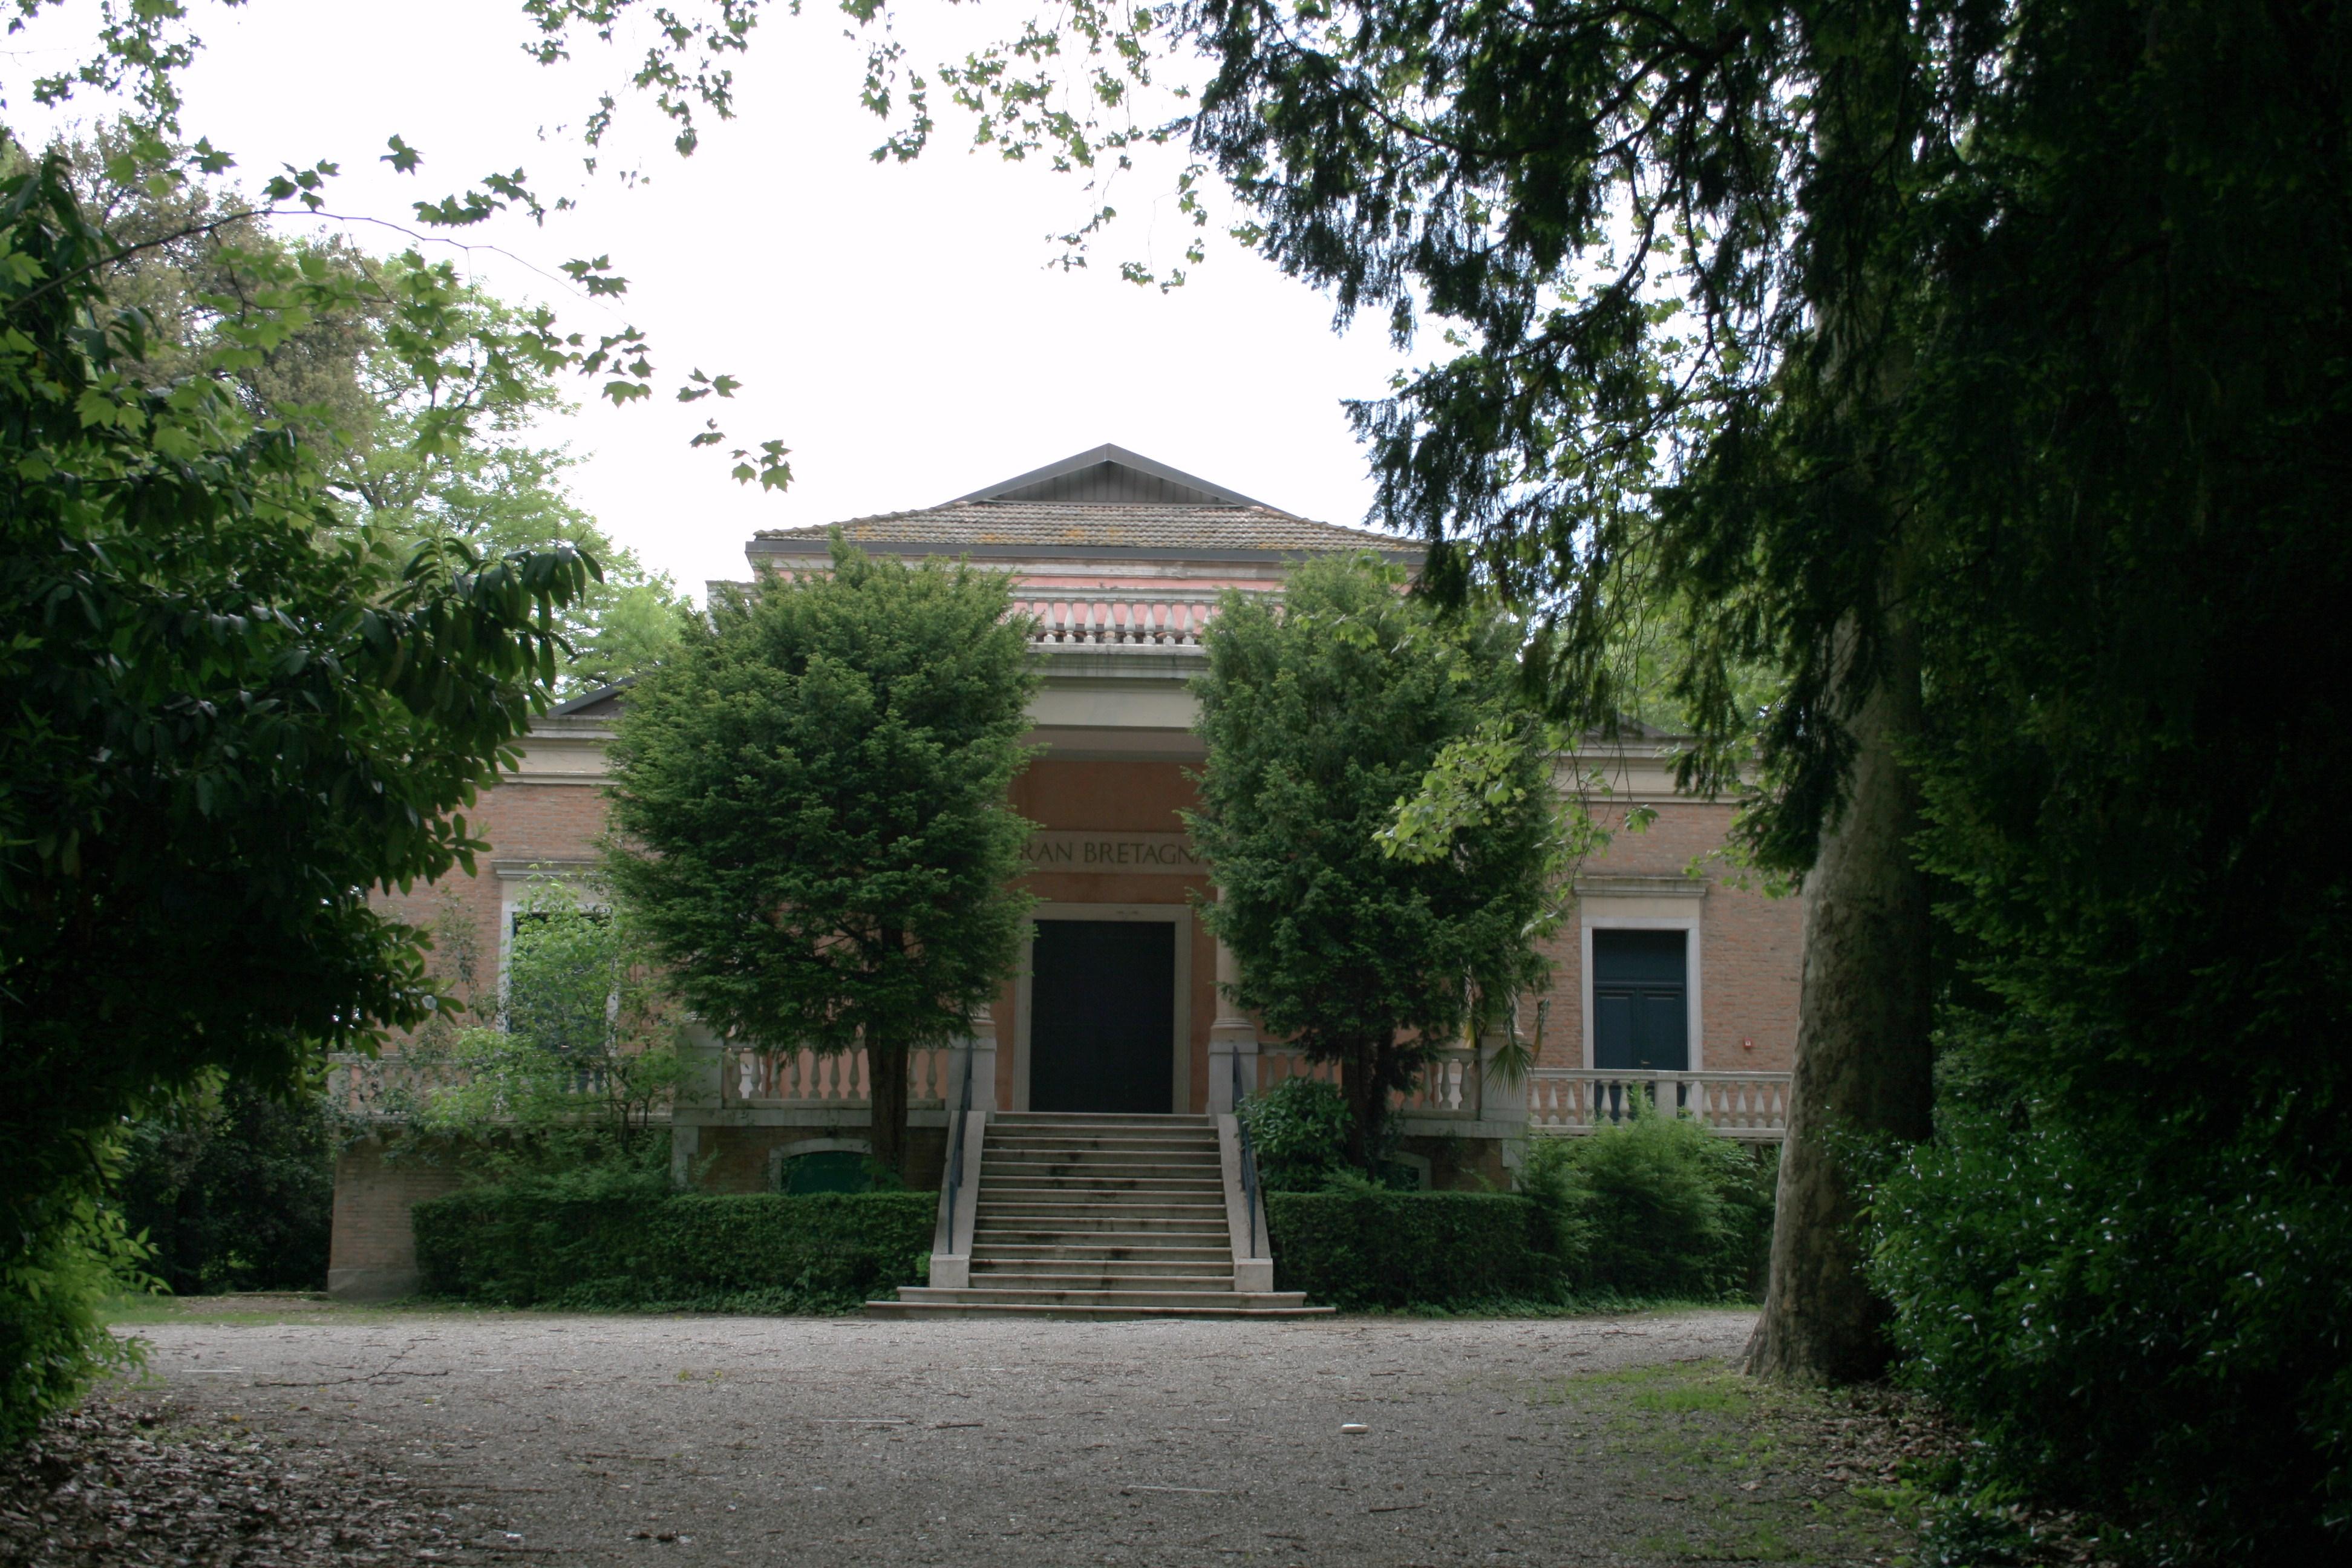 Biennale de venise for Giardini a venise